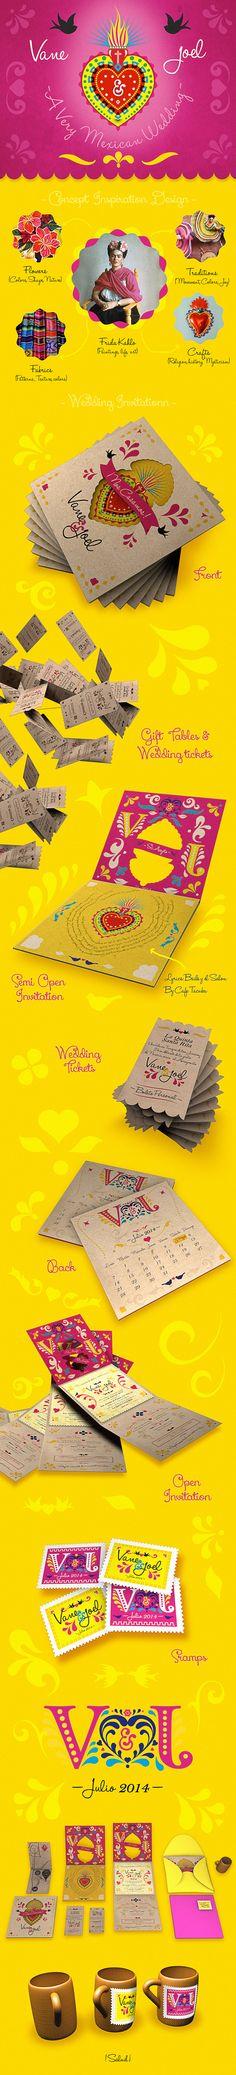 Mexican Wedding Invitation by EÑE Diseño #wedding #mexican #boda #mexicana #invitacion # invitation #rosa #mexican pink #frida